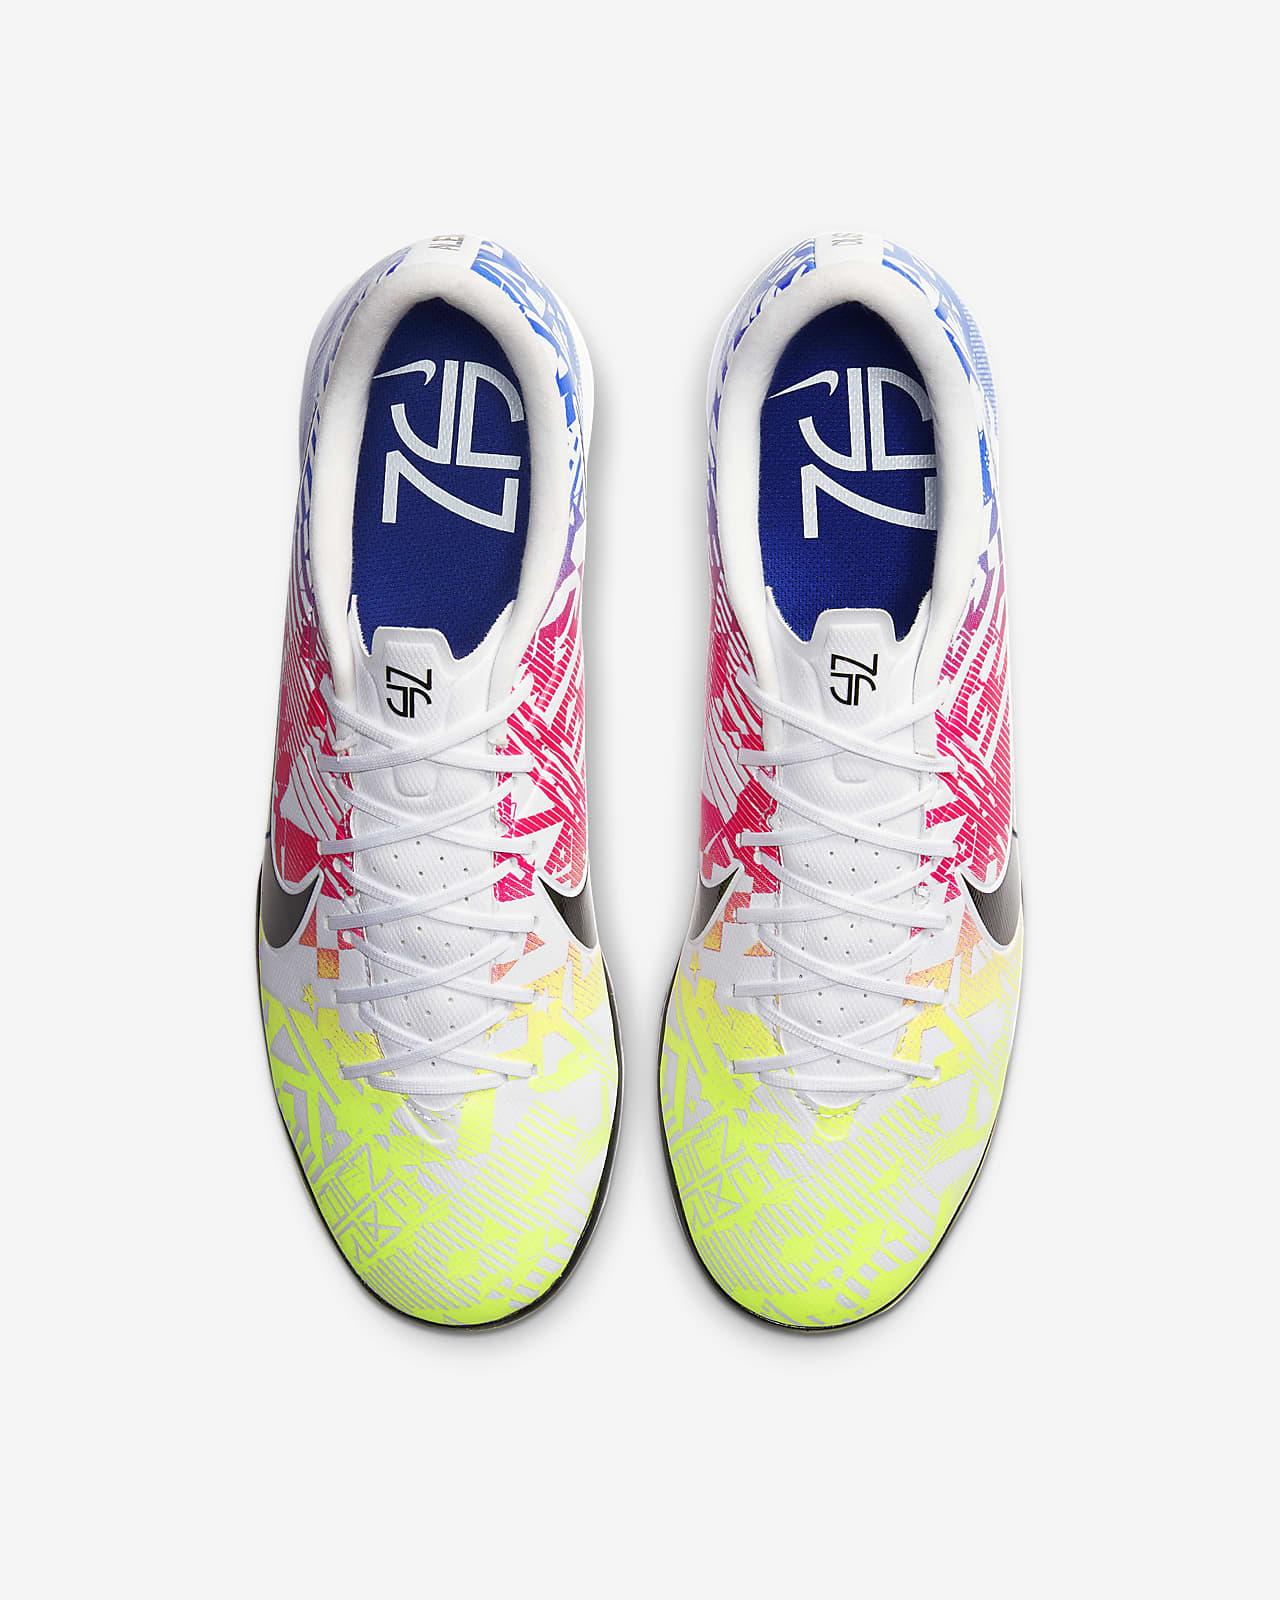 Aceptado Narabar Continente  Nike Mercurial Vapor 13 Academy Neymar Jr. IC Indoor/Court Football Shoe.  Nike AU